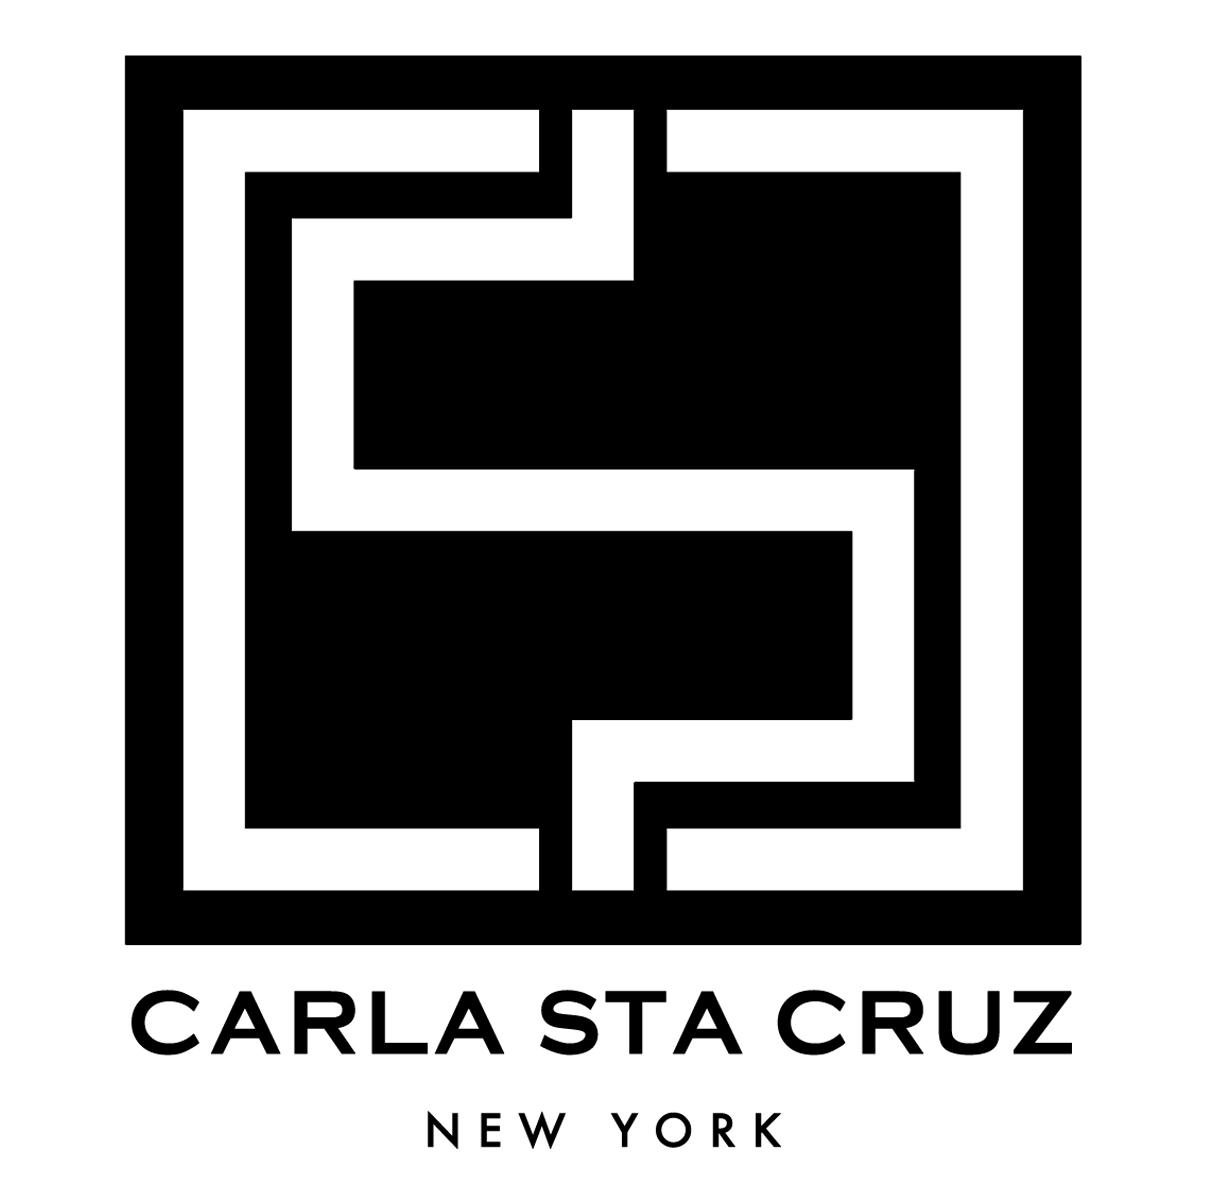 carla st cruz logo - instagram celeb.png